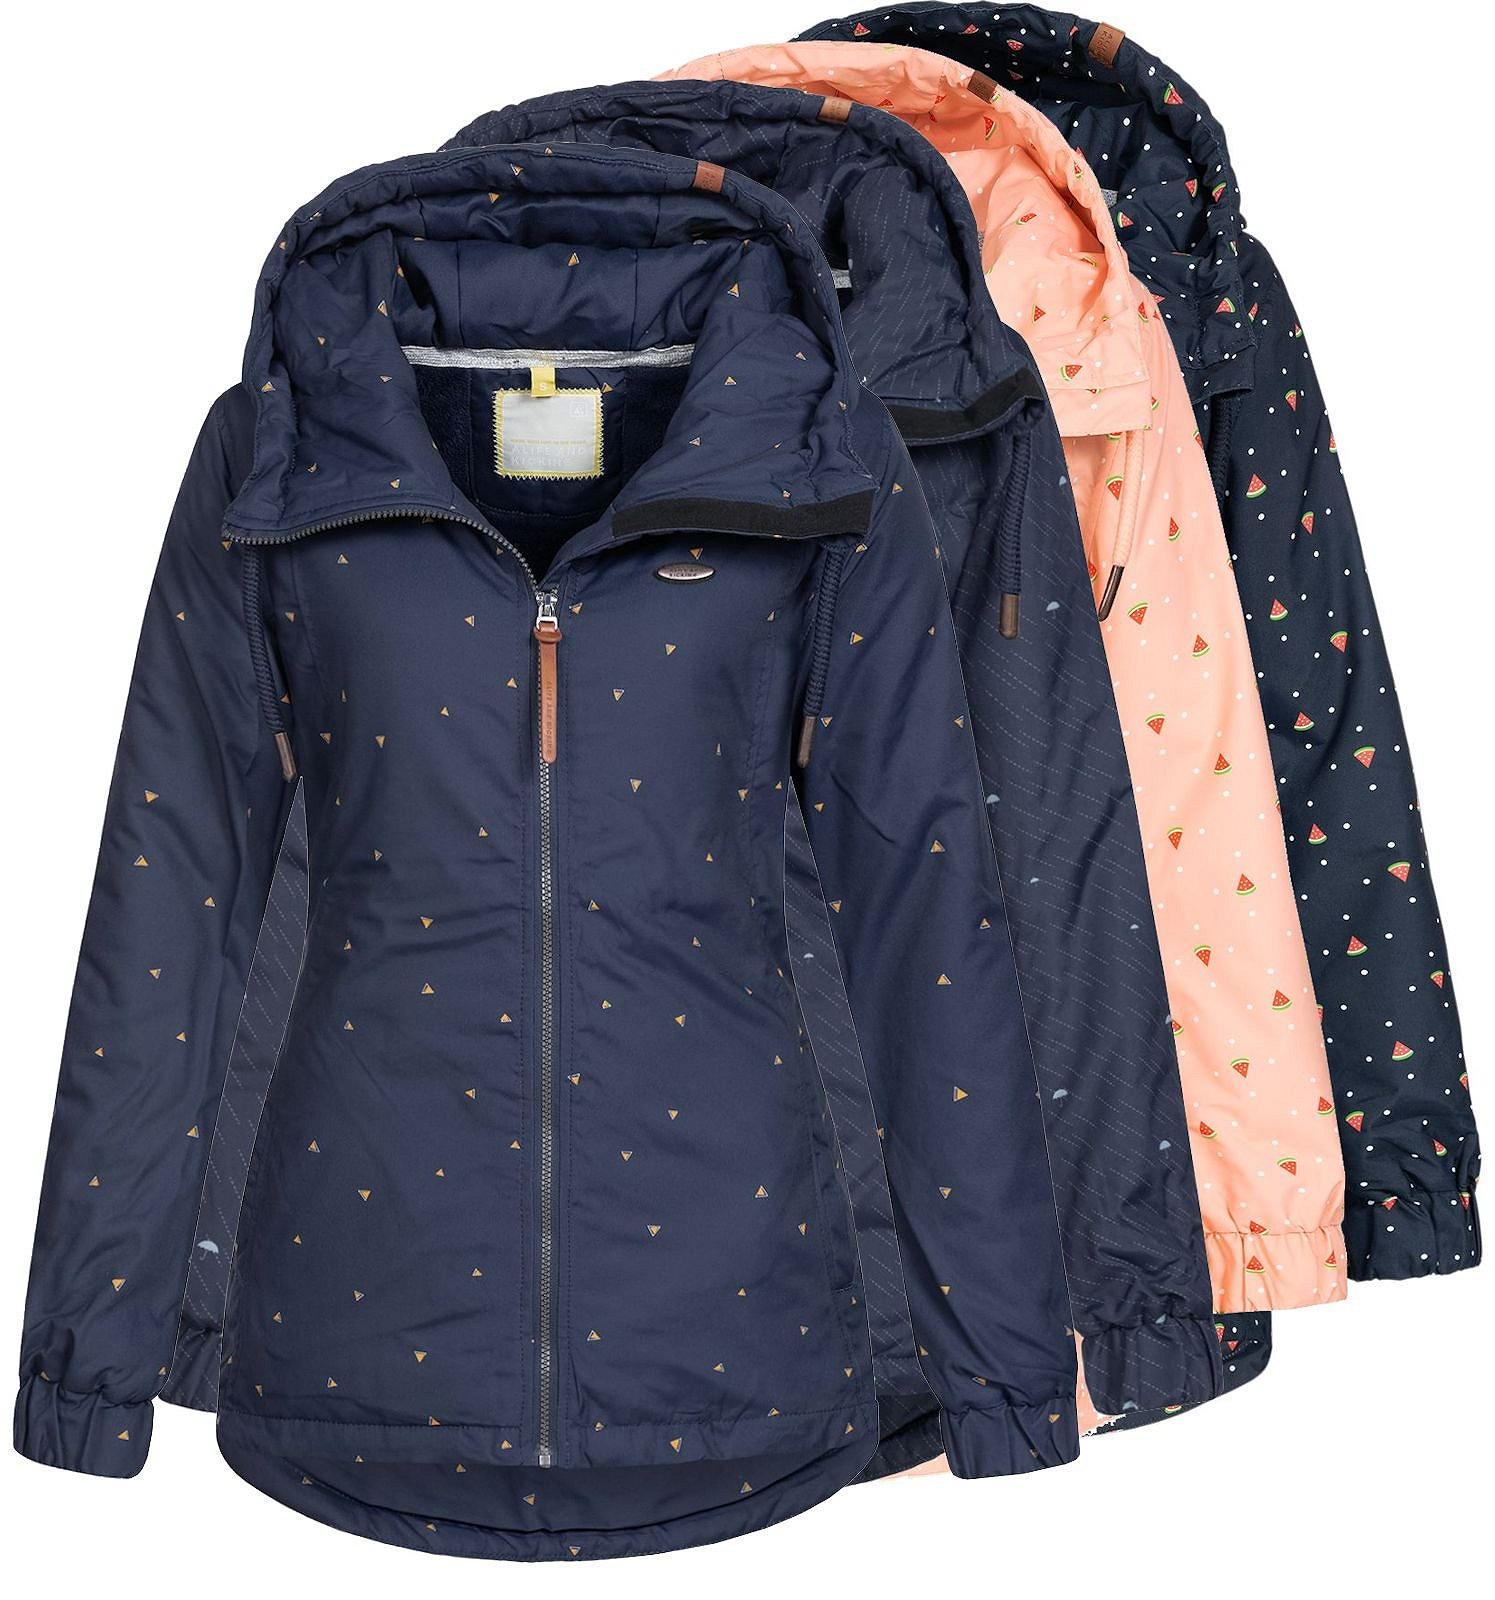 Details zu Damen Jacke Übergangsjacke Damenjacke Kapuze Parka Mantel Alife and Kickin Lilou